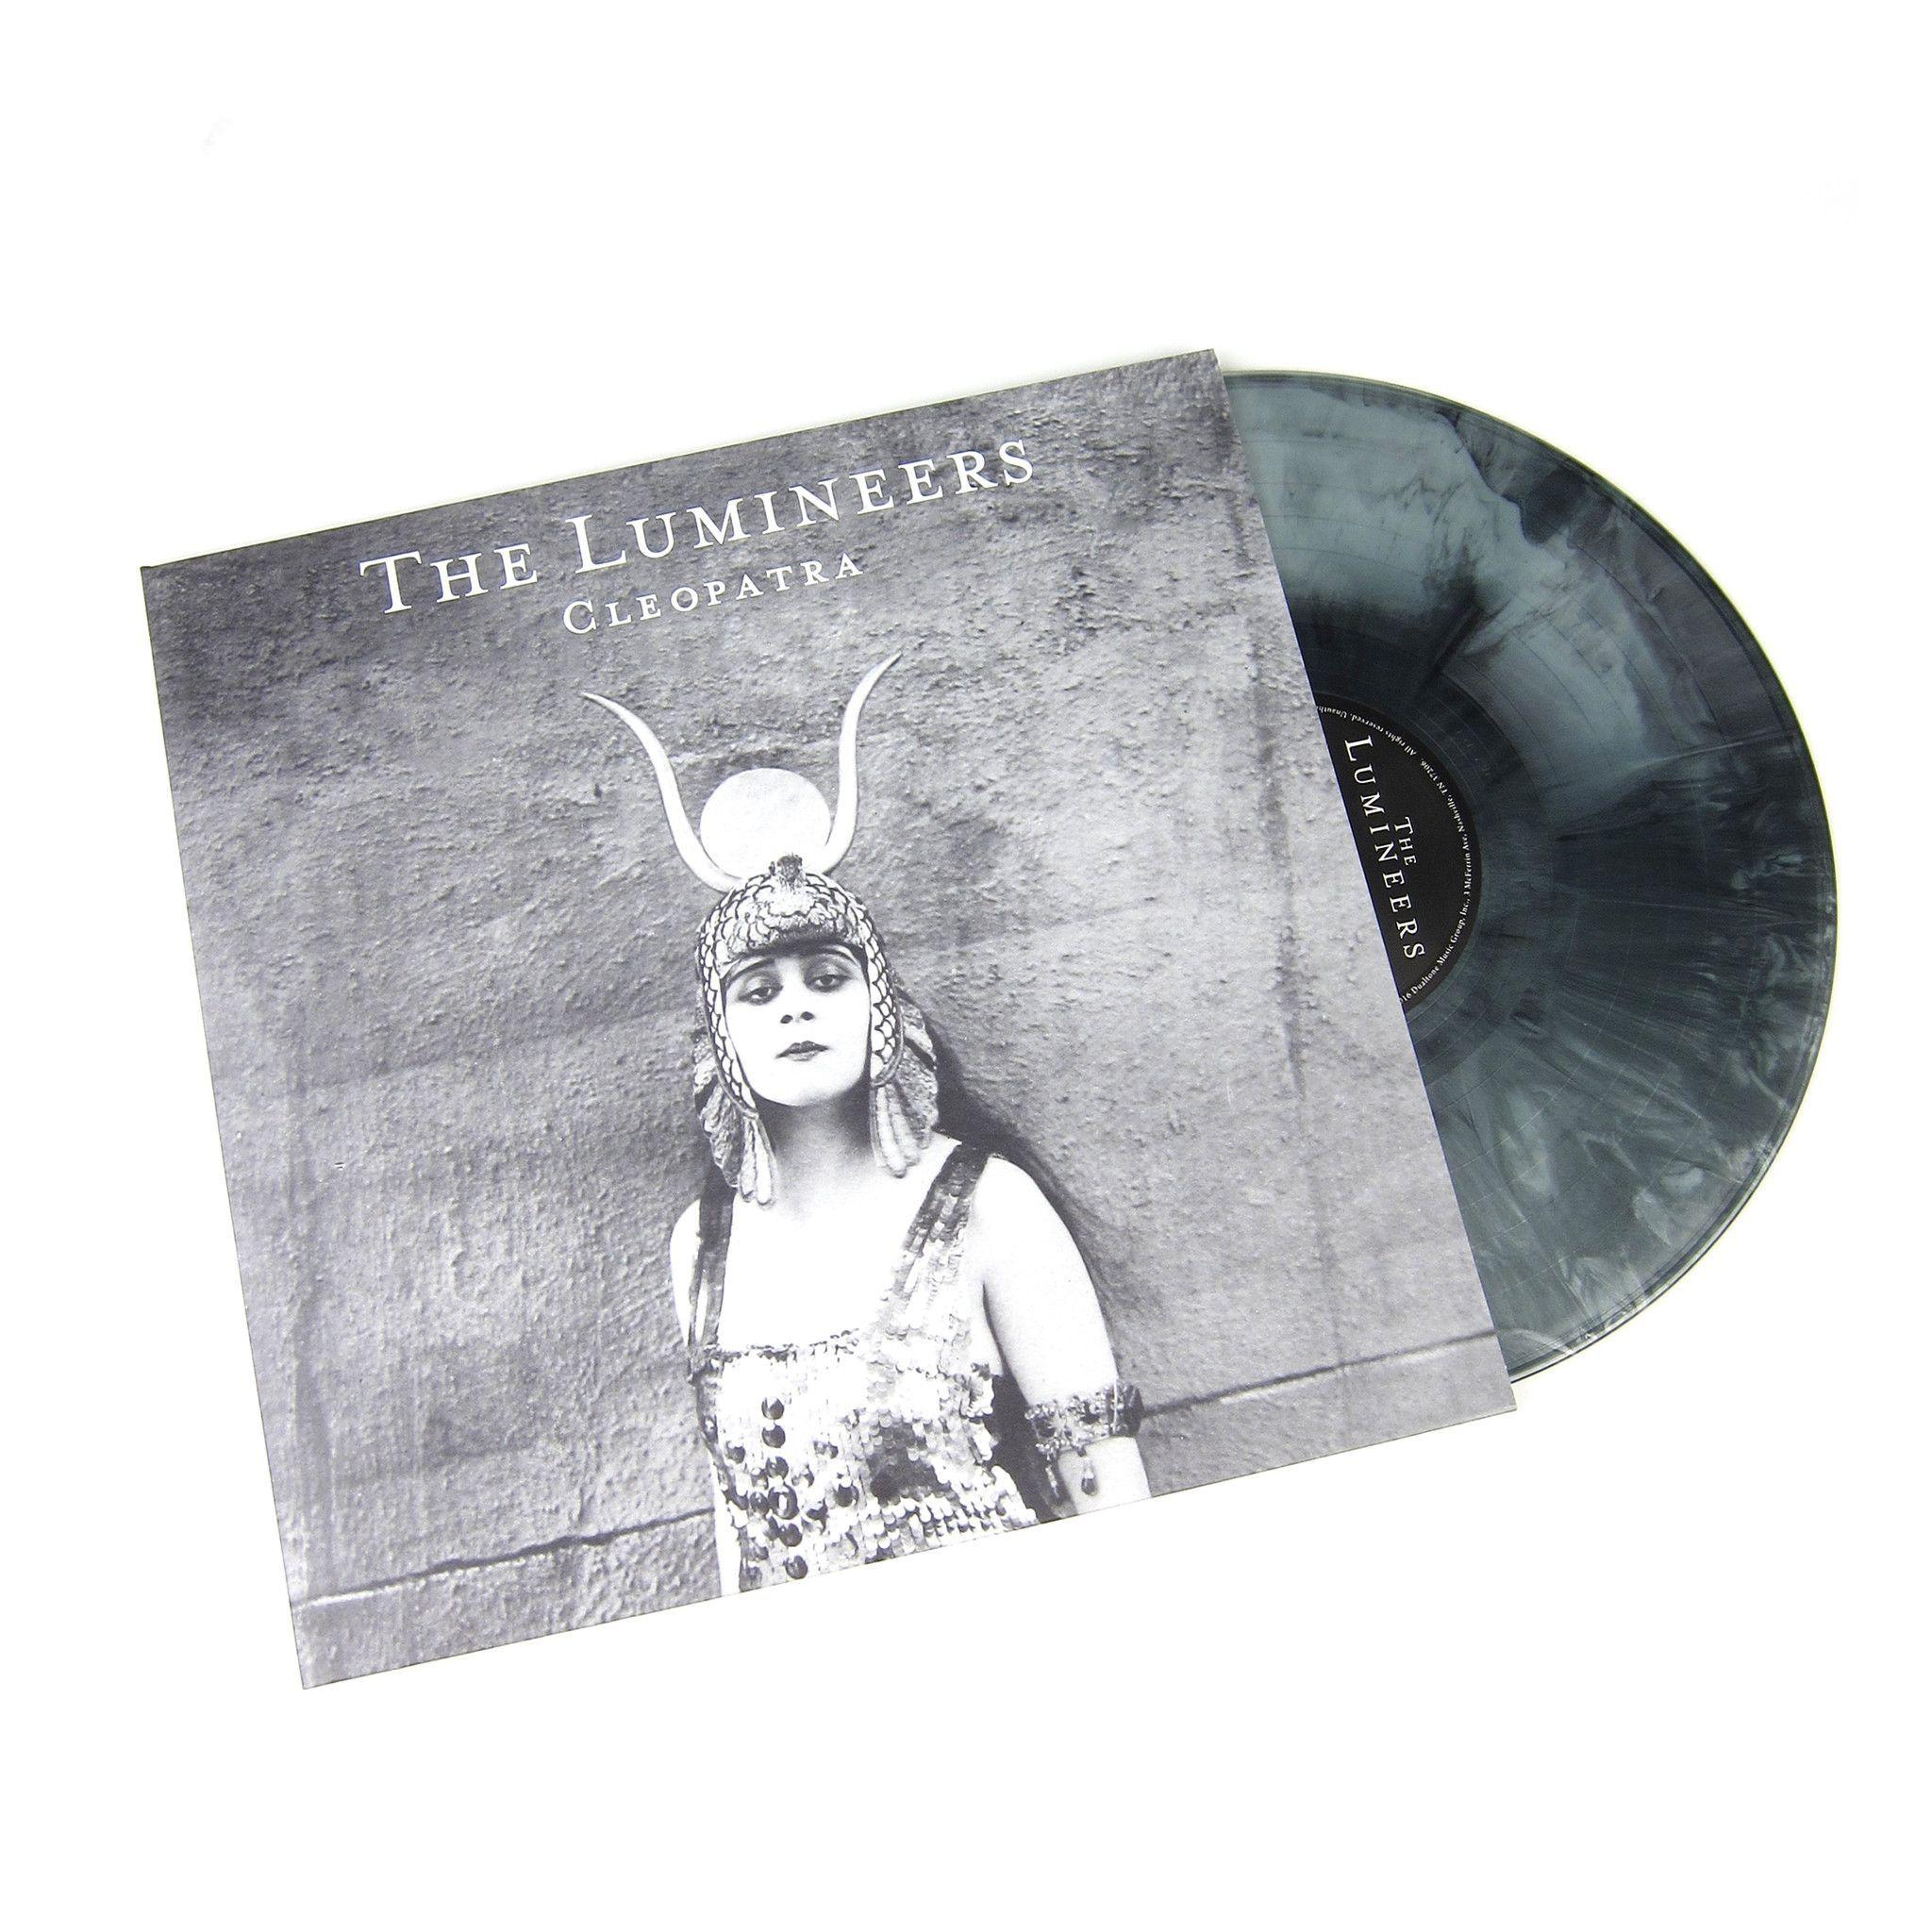 The Lumineers Cleopatra Indie Exclusive Colored Vinyl Vinyl Lp Vinyl Records Music The Lumineers Club Vinyl